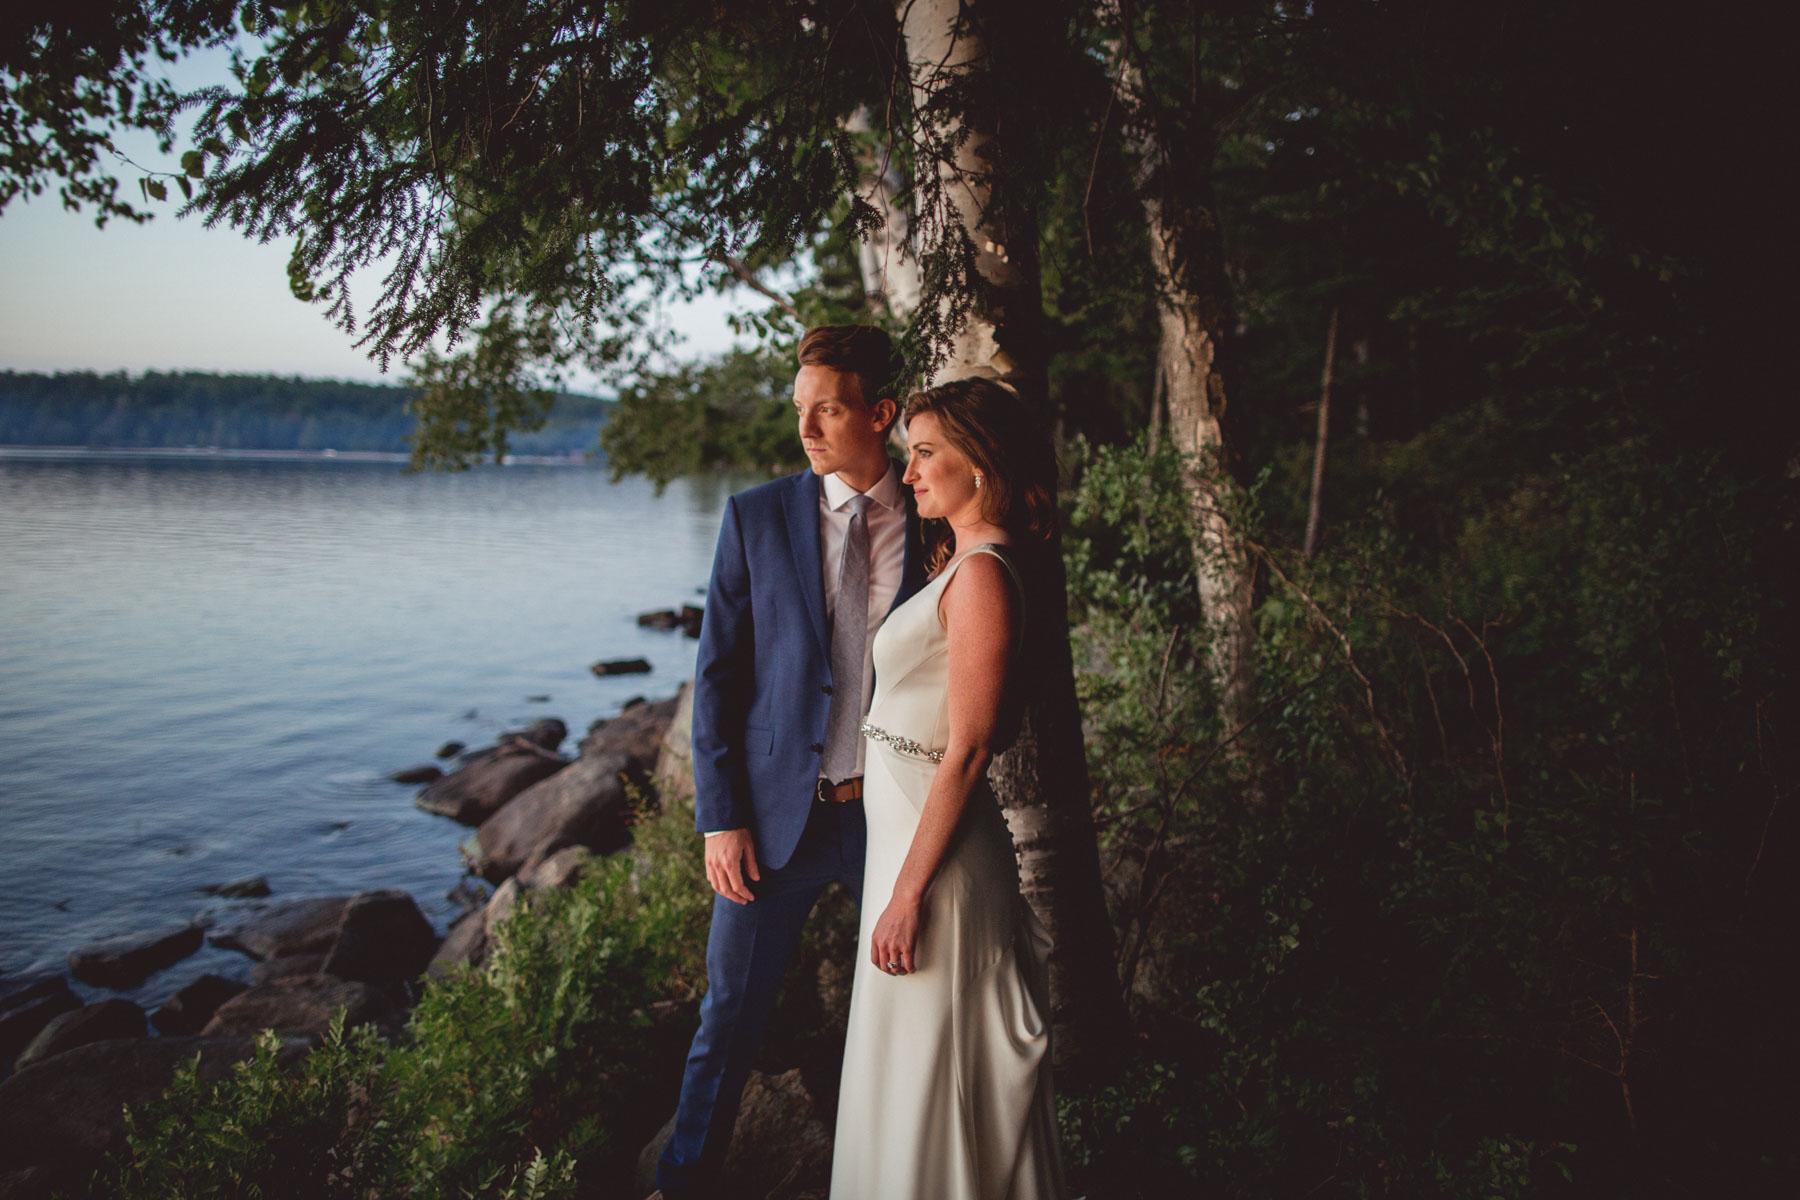 Wedding-Photography-Campground-32.jpg